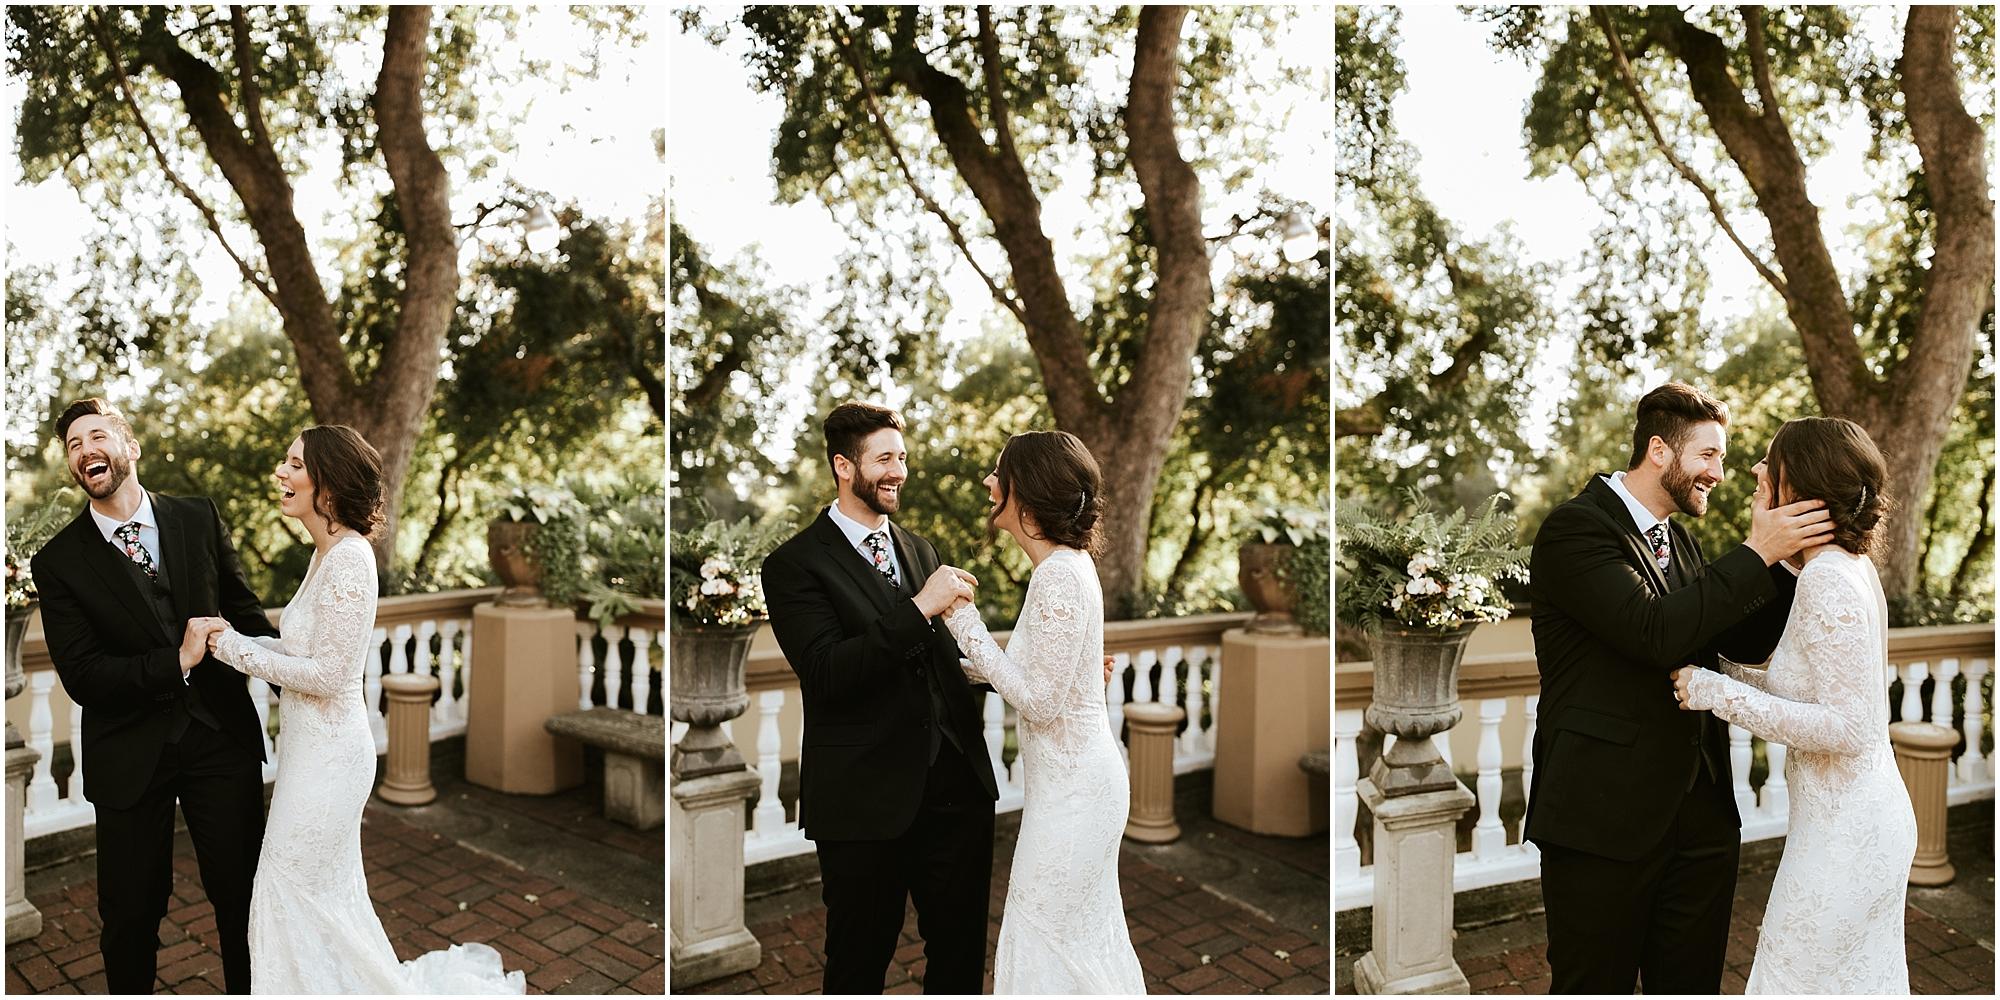 Lairmont Manor Wedding Bellingham Cassie Trottier Photo1067.jpg